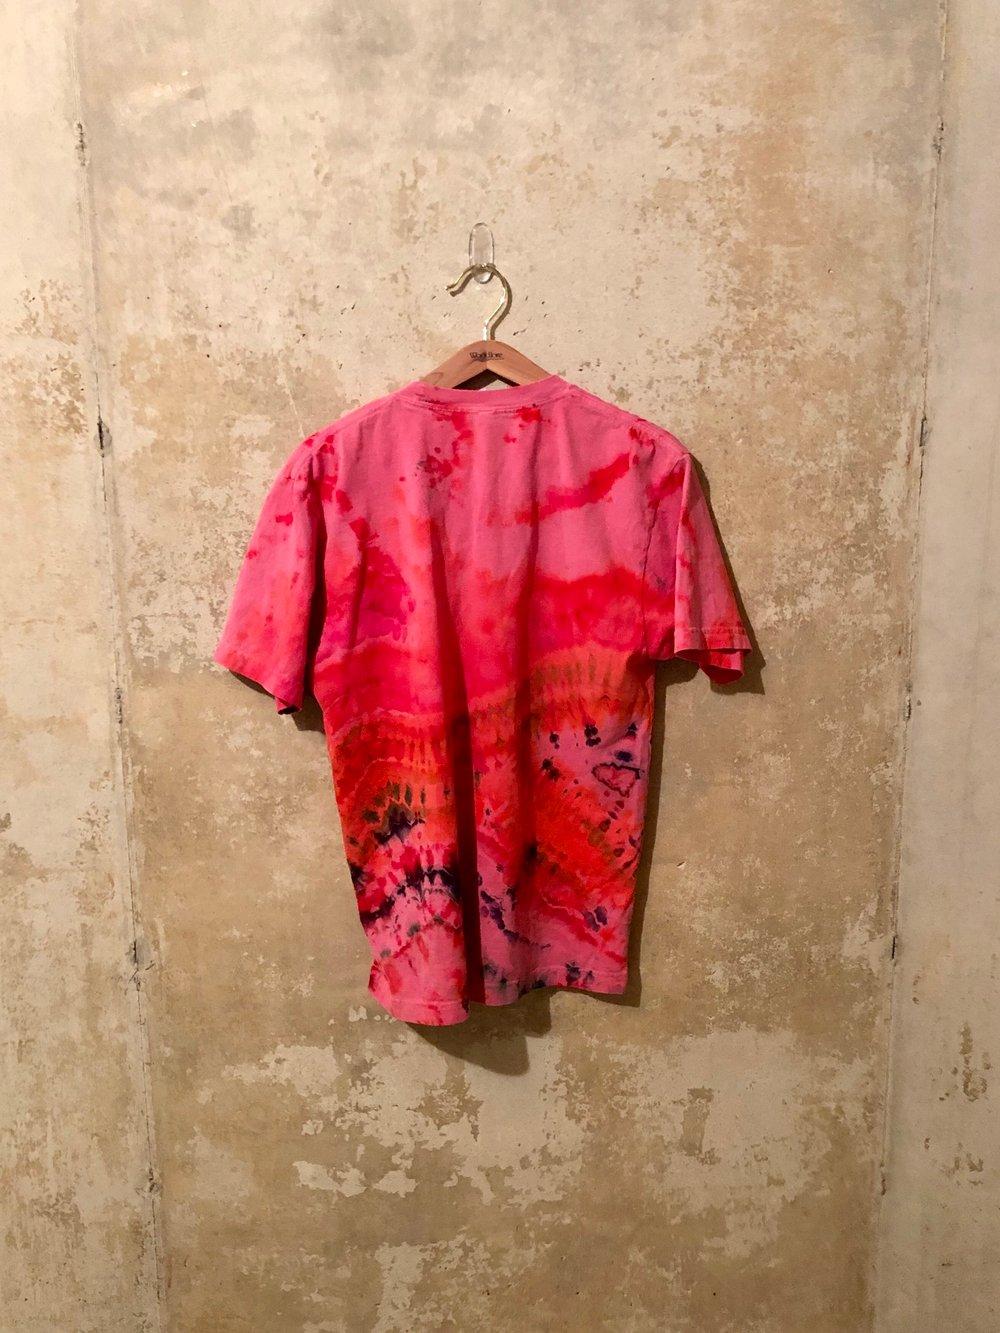 Small Puff Print Tye Dye Shirt #8